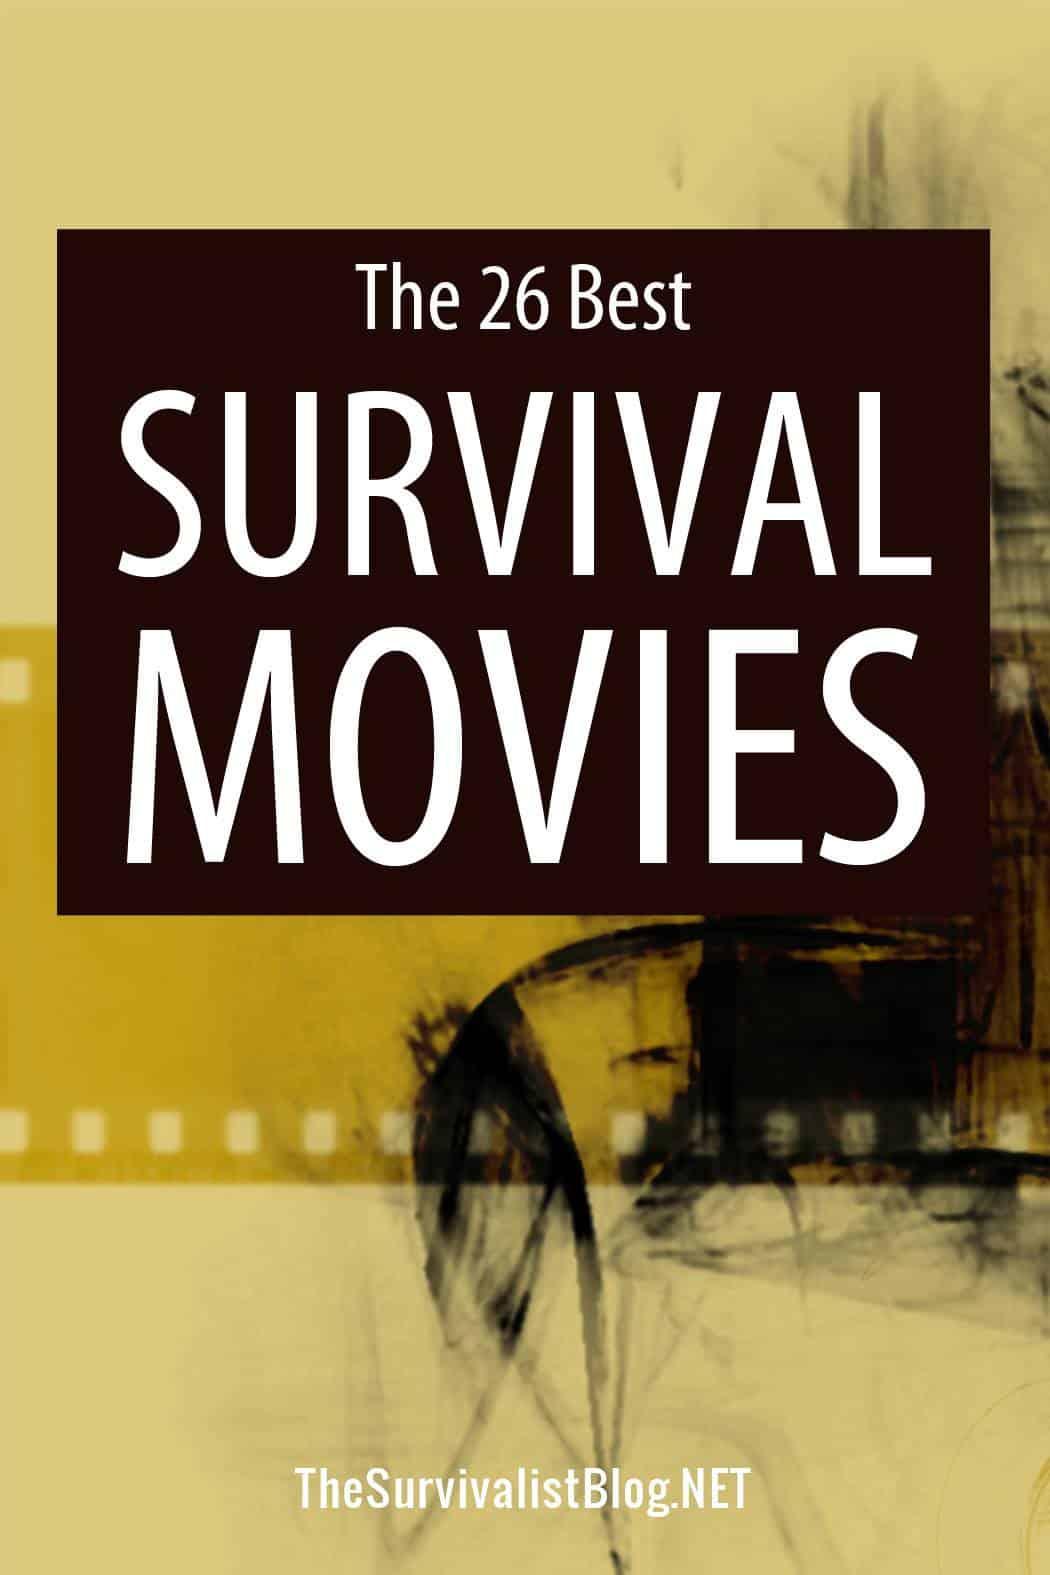 survival movies pinterest image